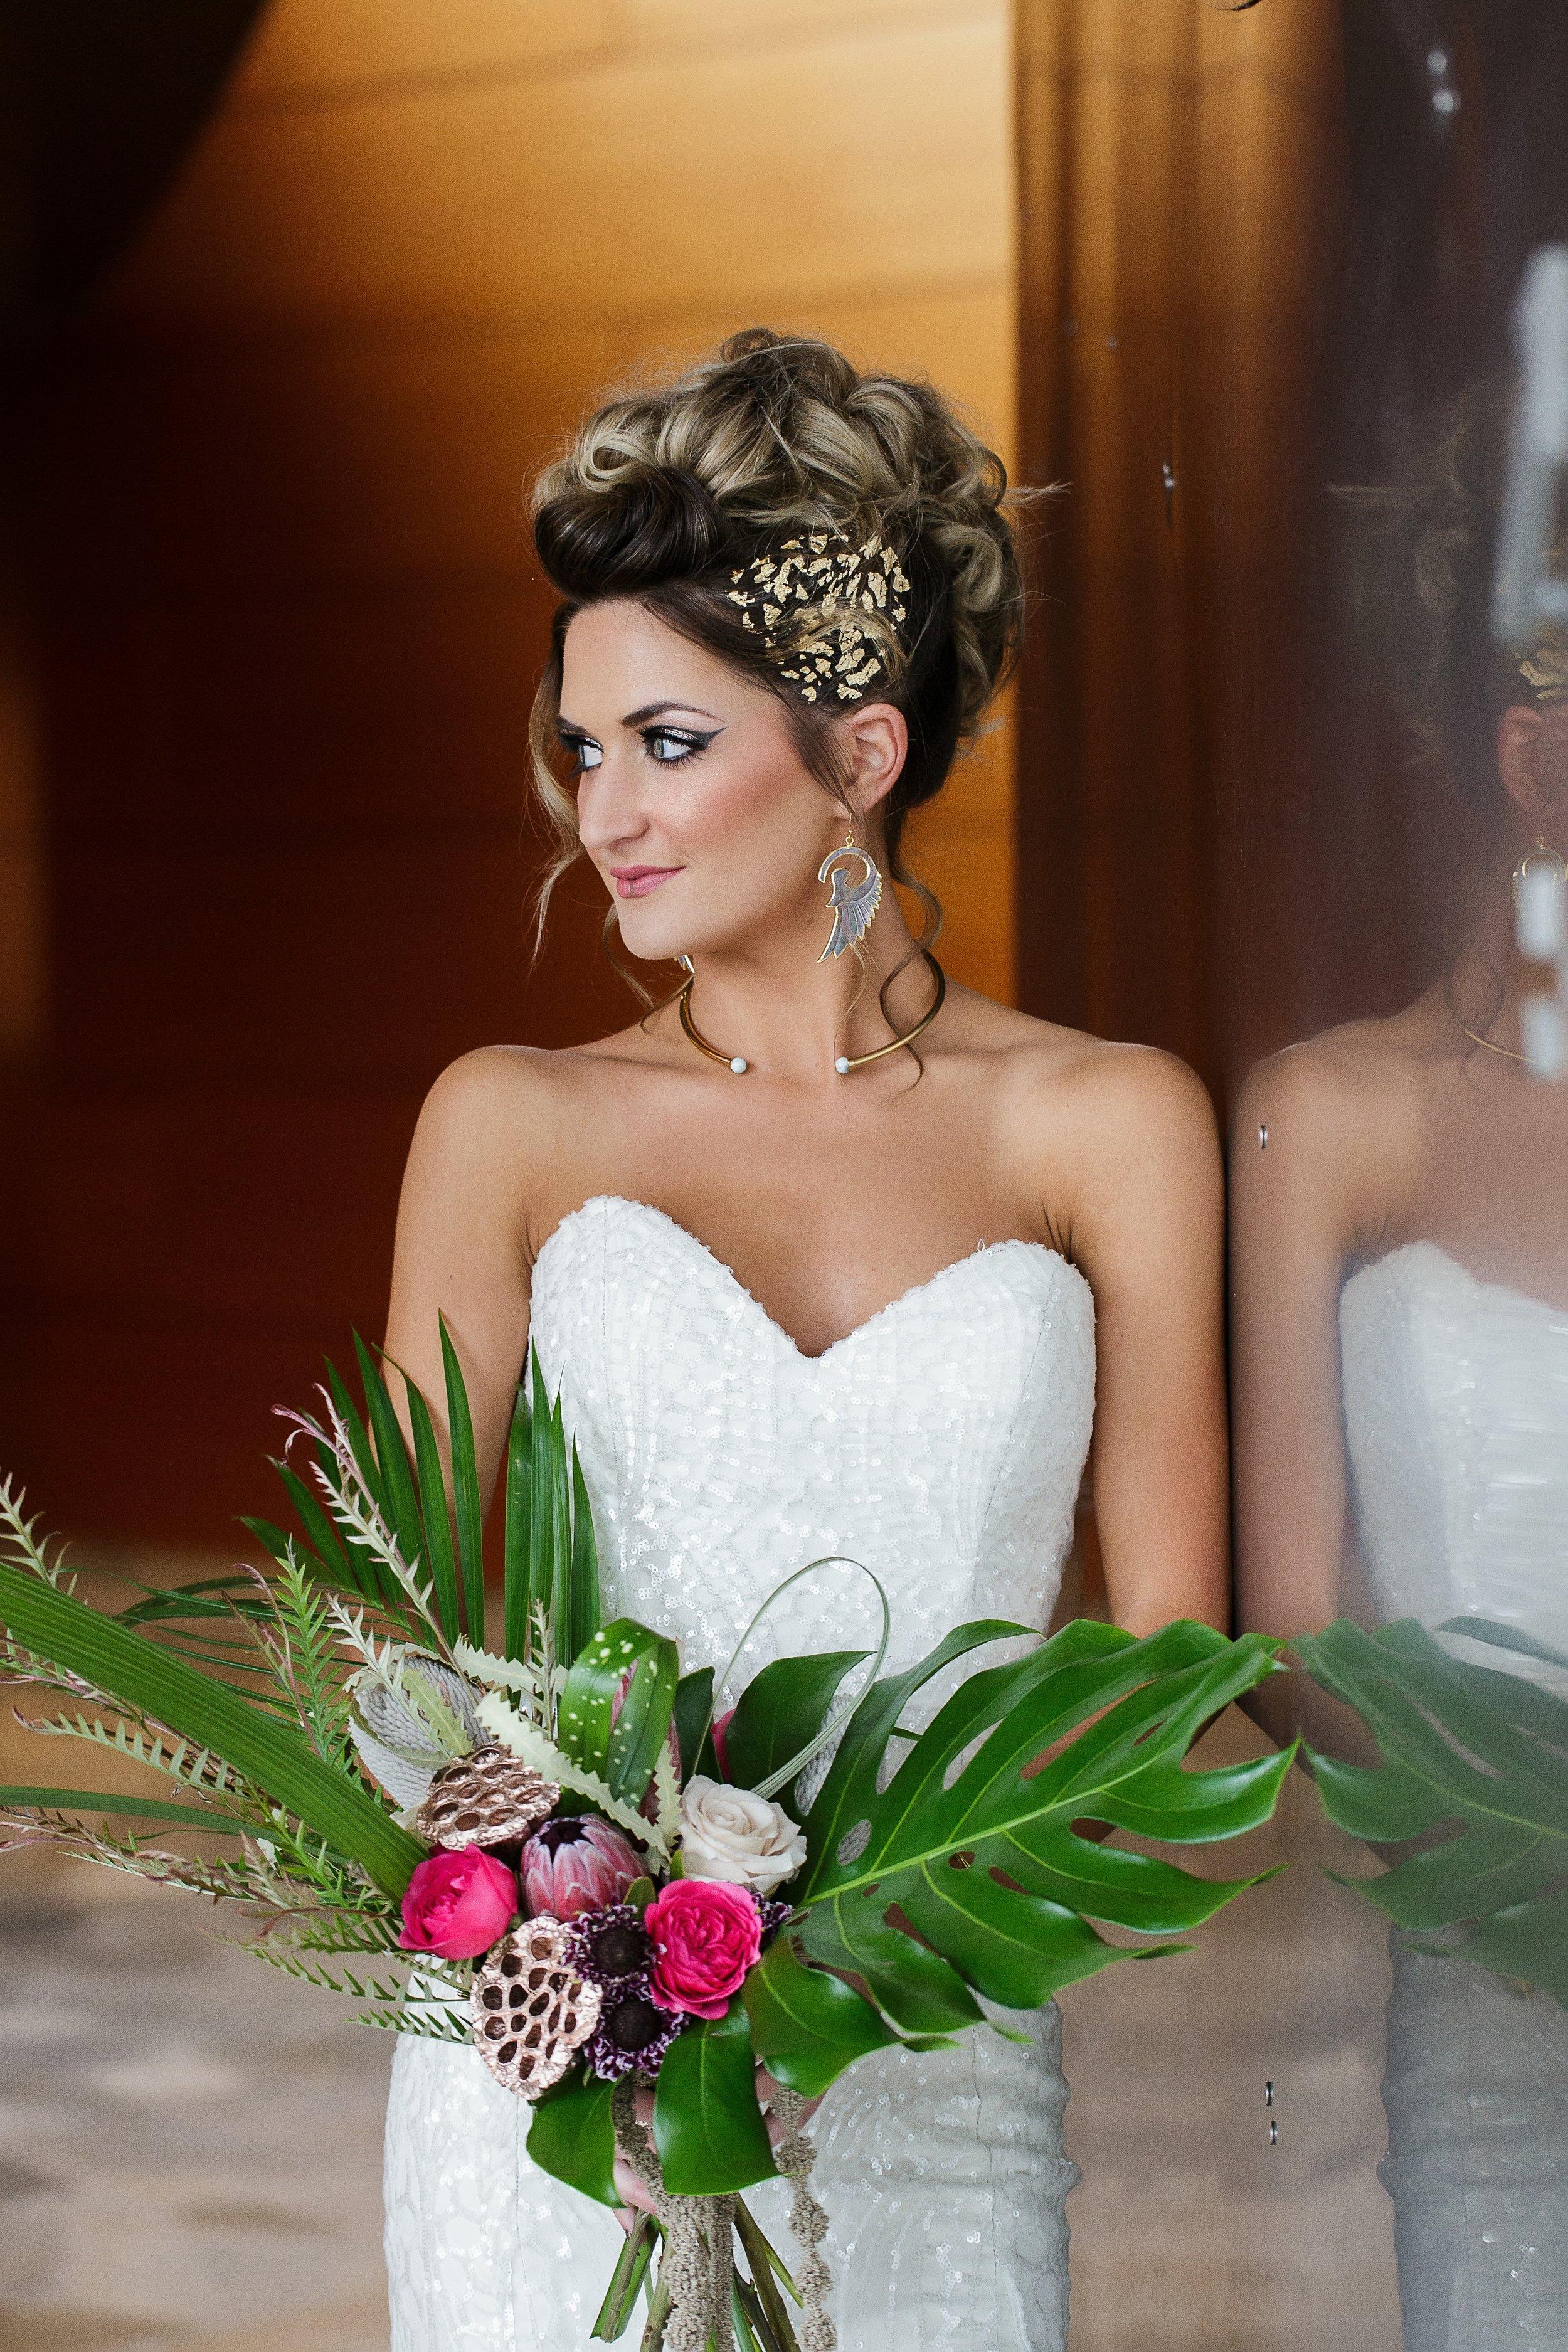 Fox-and-Fern-Bridal-Bouquet-2050-Styled-Shoot.jpg